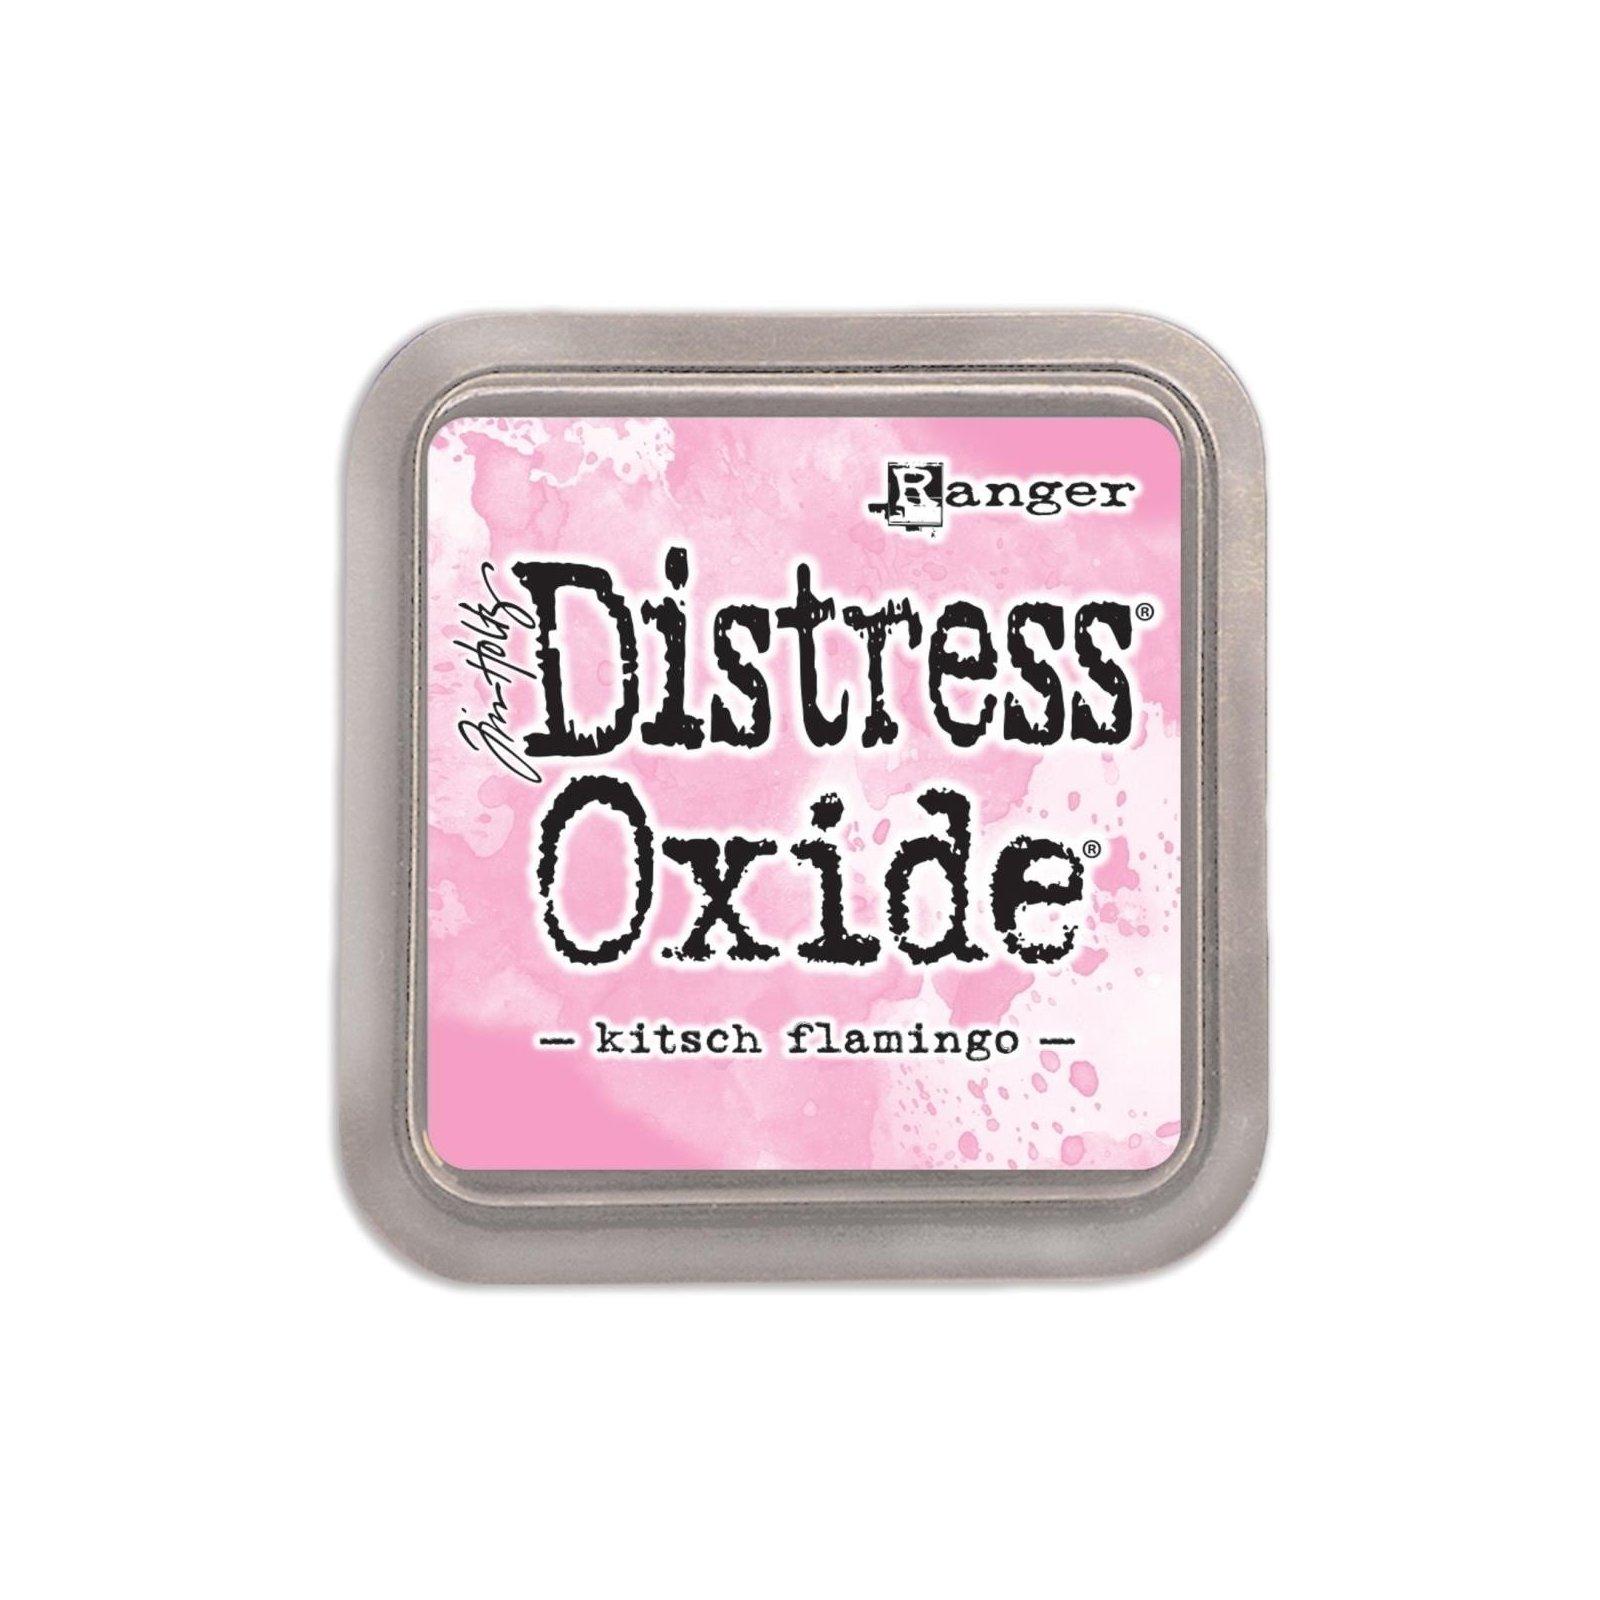 Grand encreur rose Distress Oxide - Kitsch Flamingo - Ranger